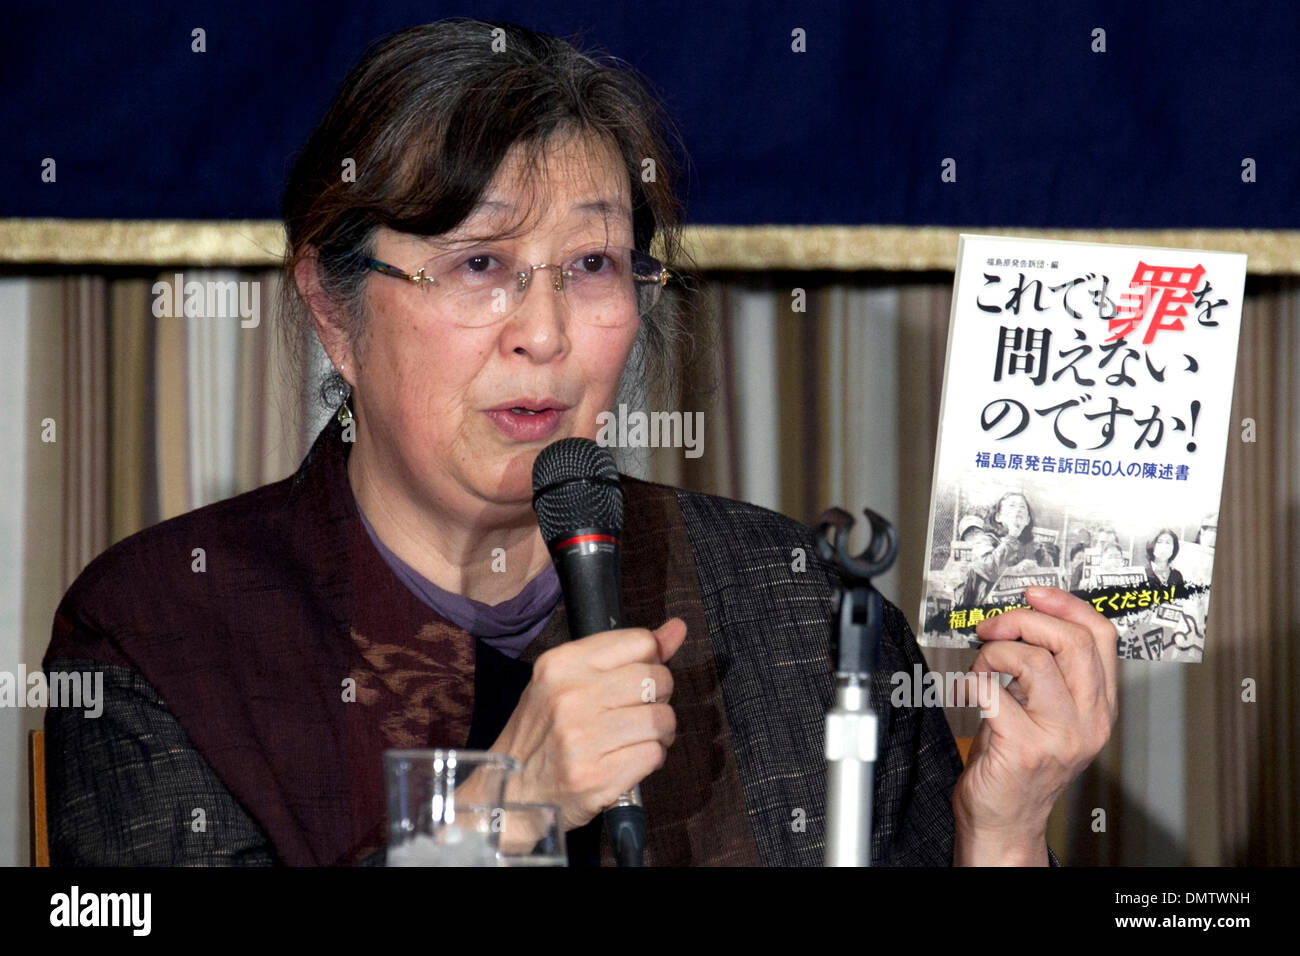 Tokyo, Japan. 17th December 2013. - Representative of Fukushima Disaster Plaintiffs, Ruiko Mutoh shows the book Stock Photo